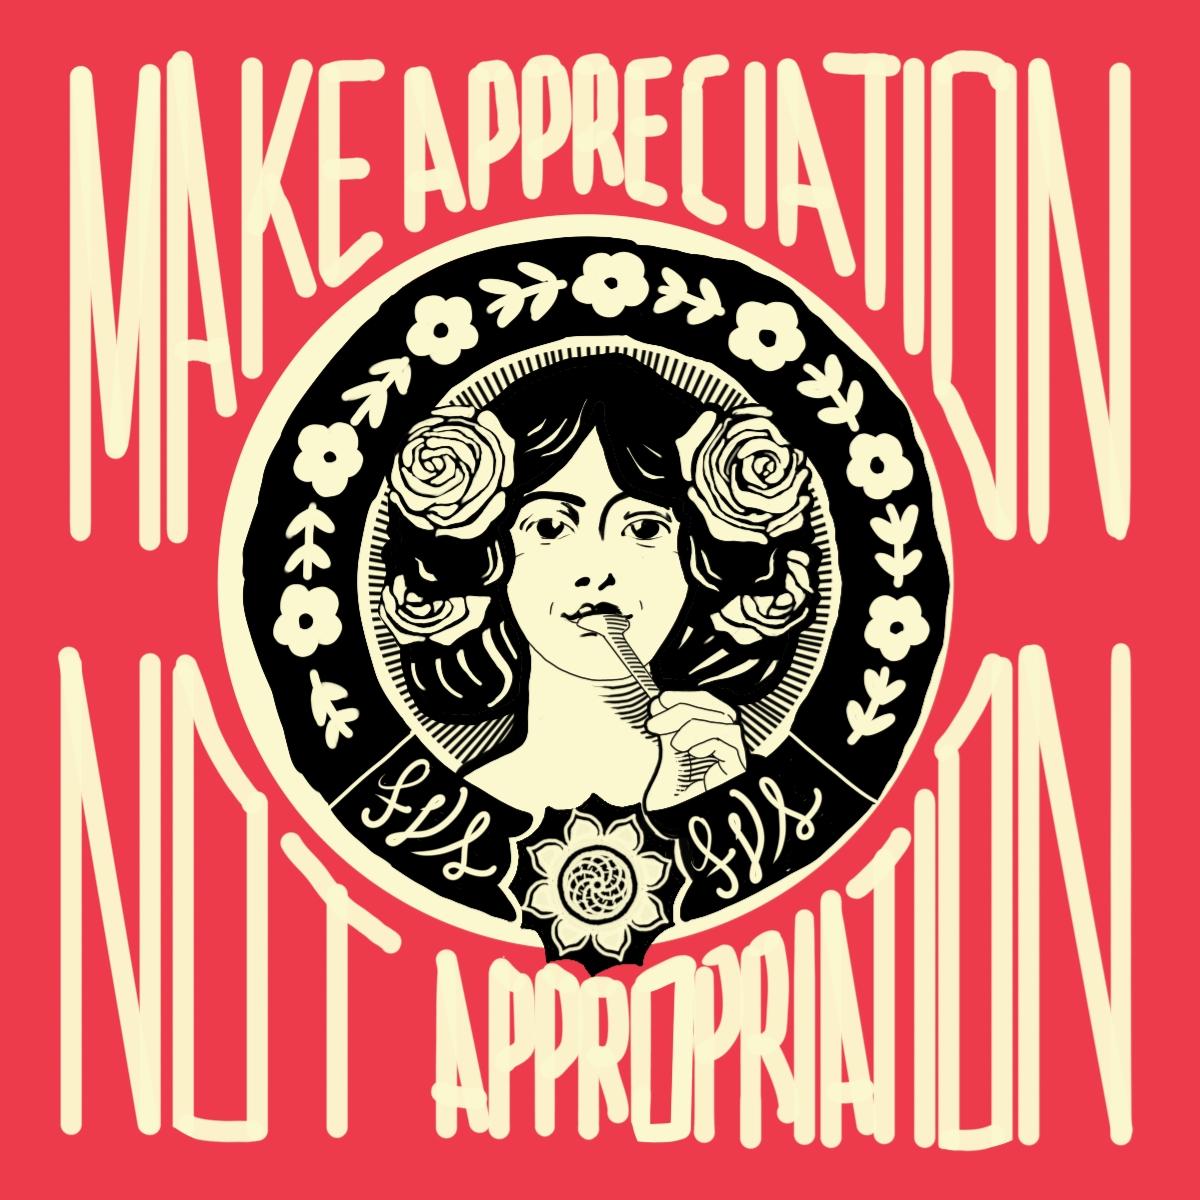 Make Appreciation Not Appropriation